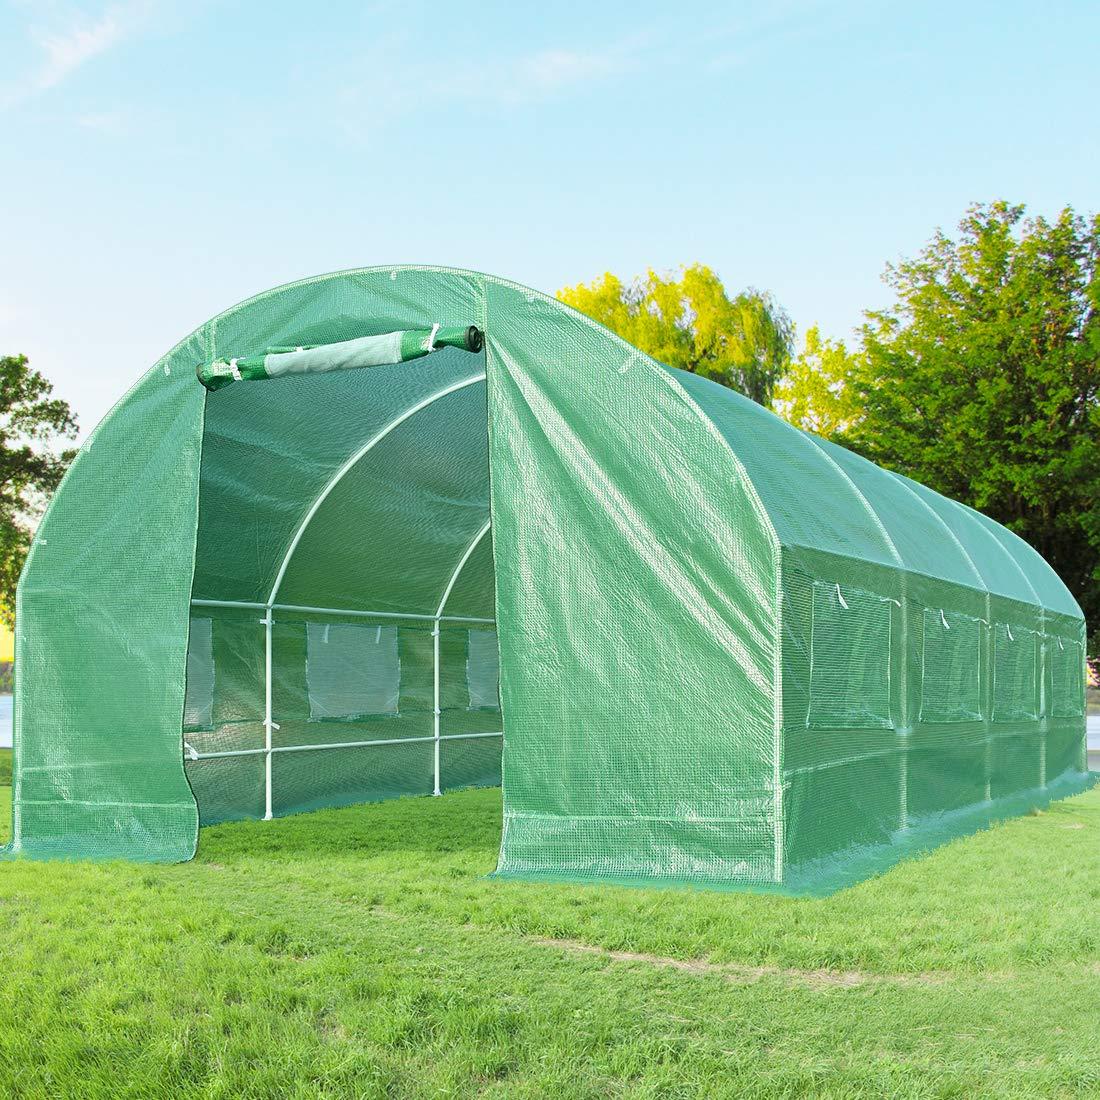 Quictent 2 Doors 20 Stakes Heavy Duty 19.7'x10'x6.6' Portable Greenhouse Large Walk-in Green Garden Hot House 8 Vents + 2 Doors Flow-Through Ventilation